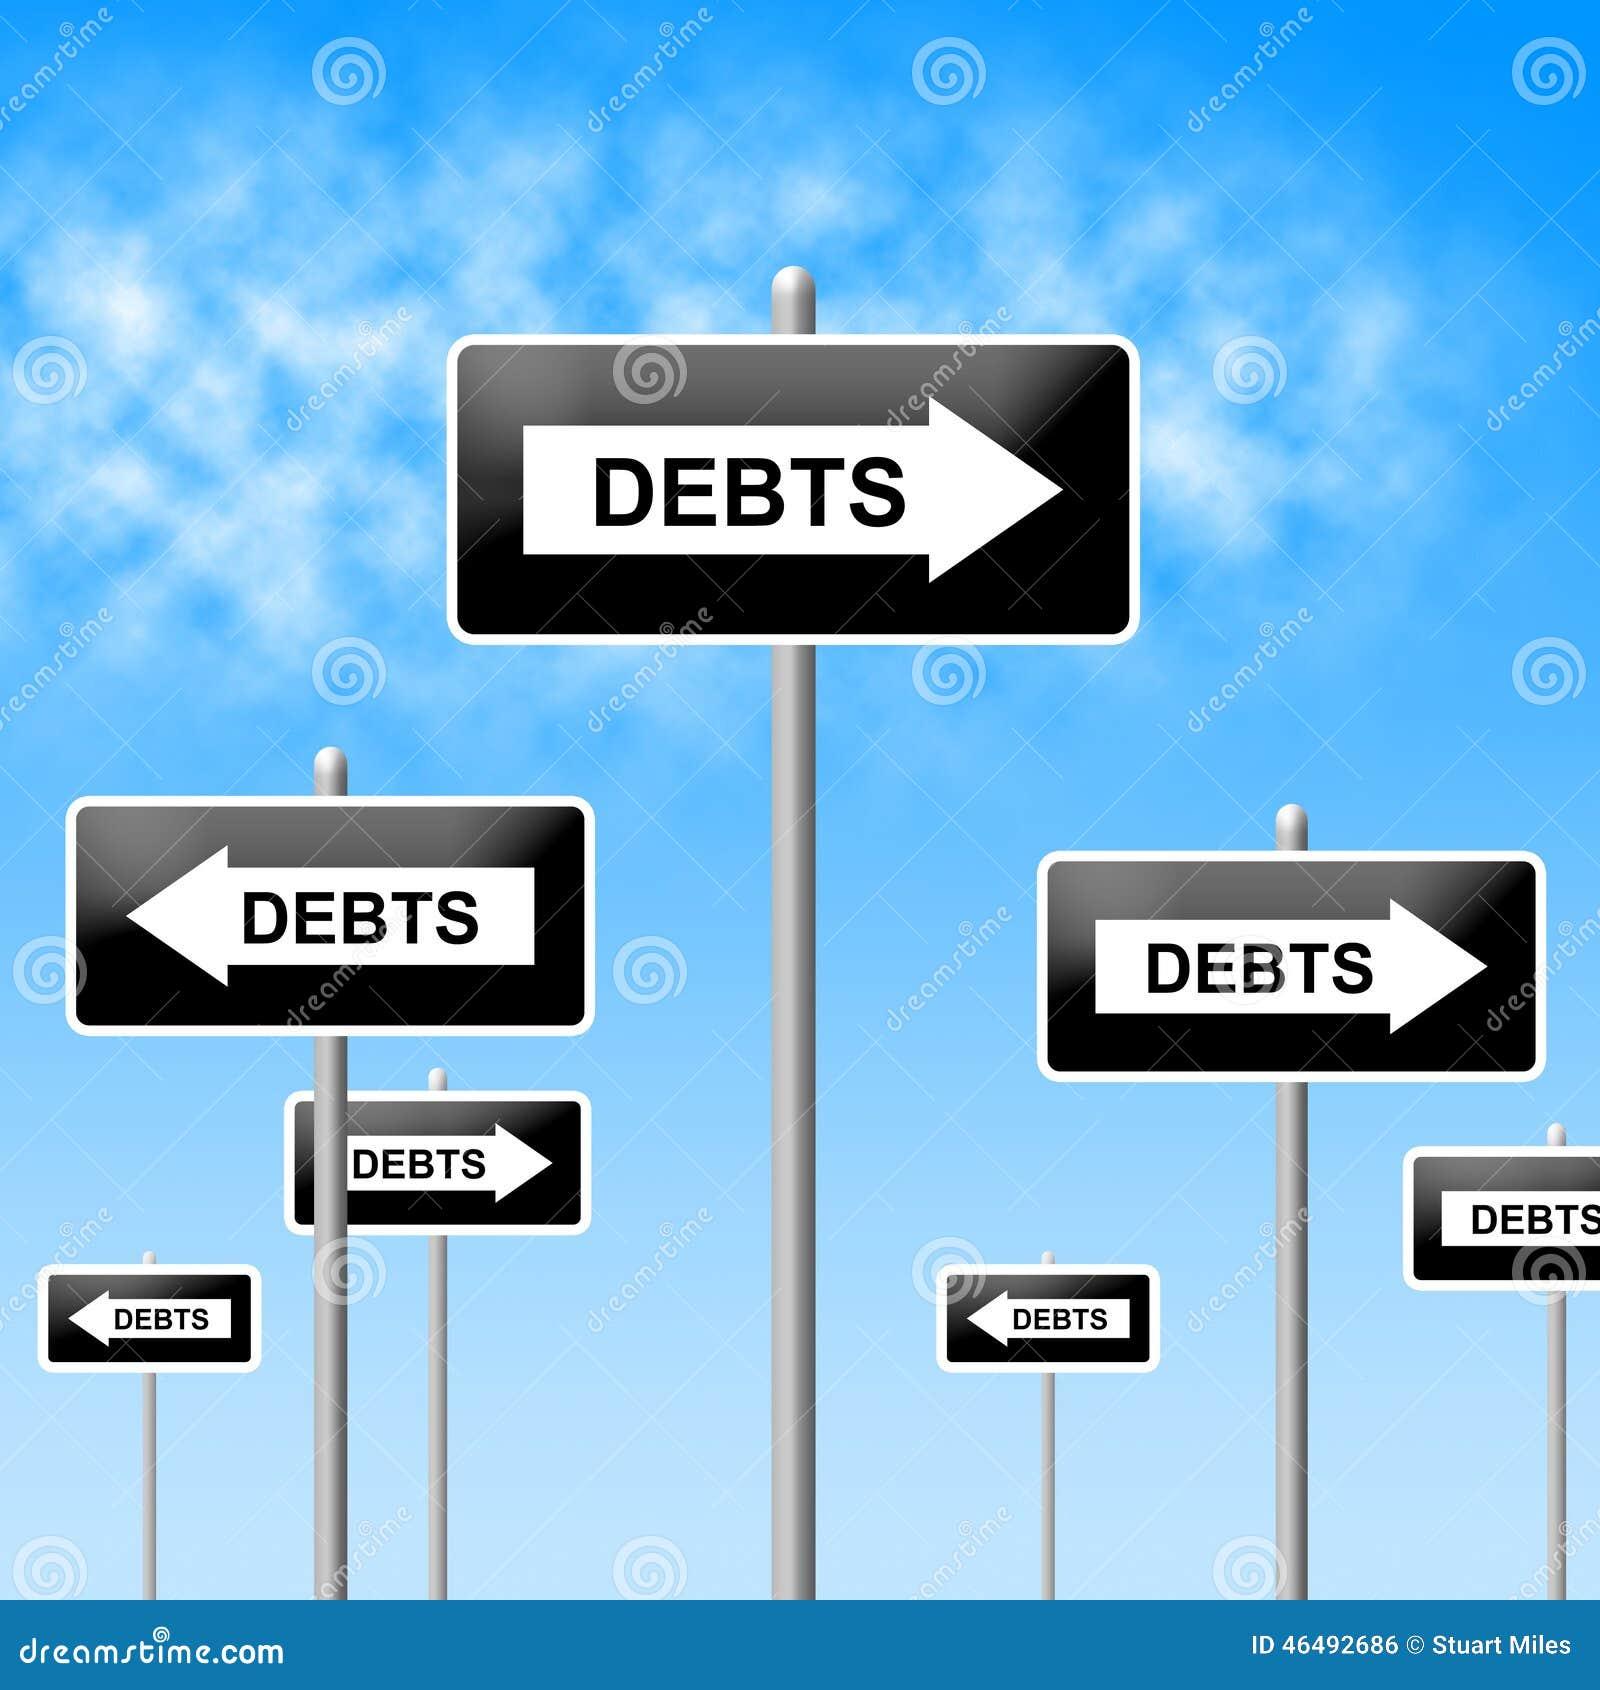 Finance Sign: Debts Sign Shows Financial Obligation And Finance Stock